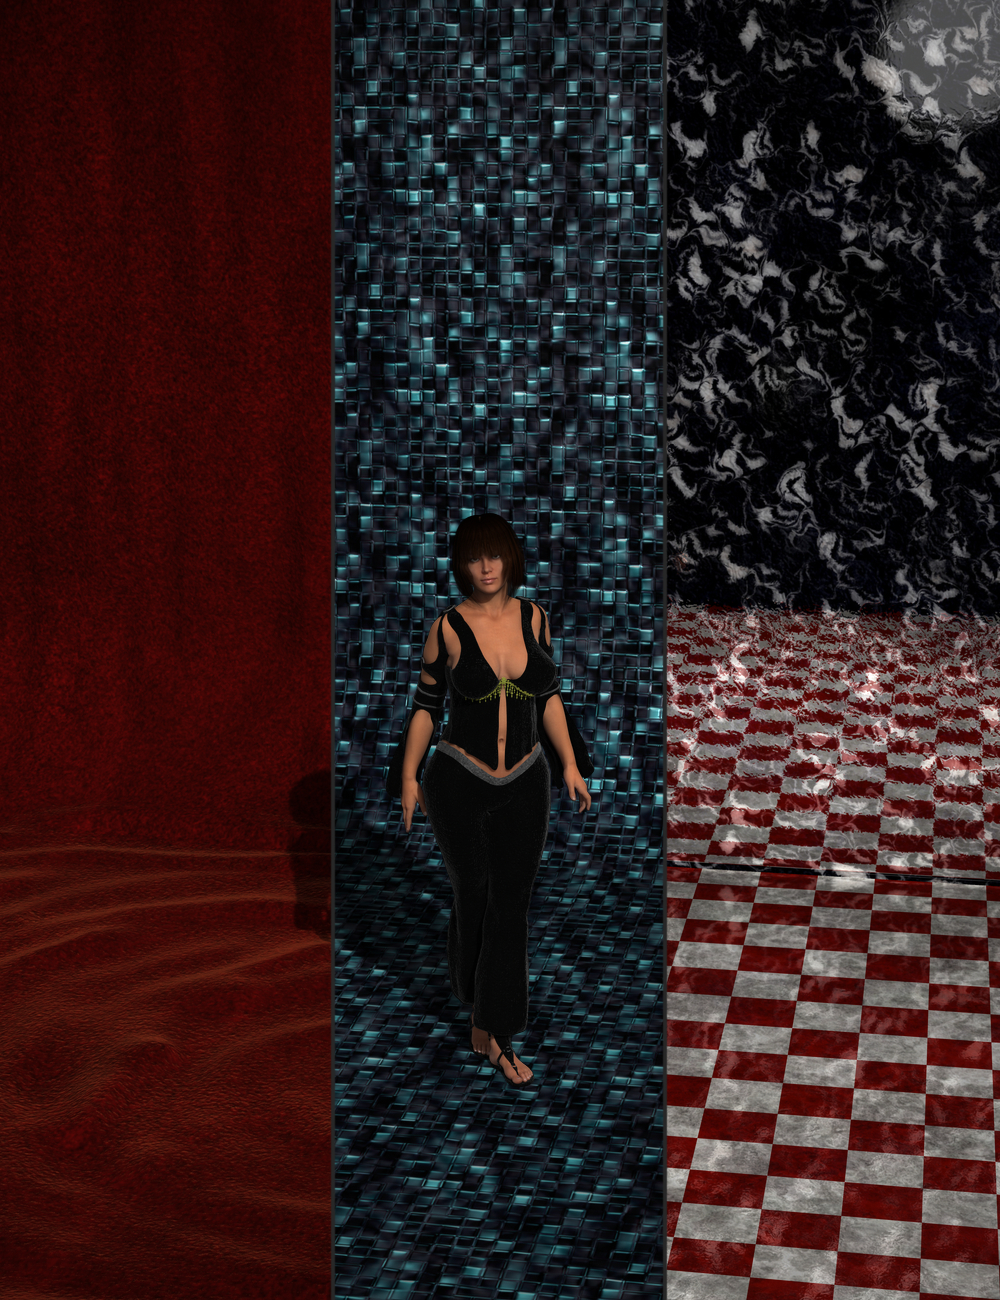 FSL Bashable Backdrop by: Fuseling, 3D Models by Daz 3D